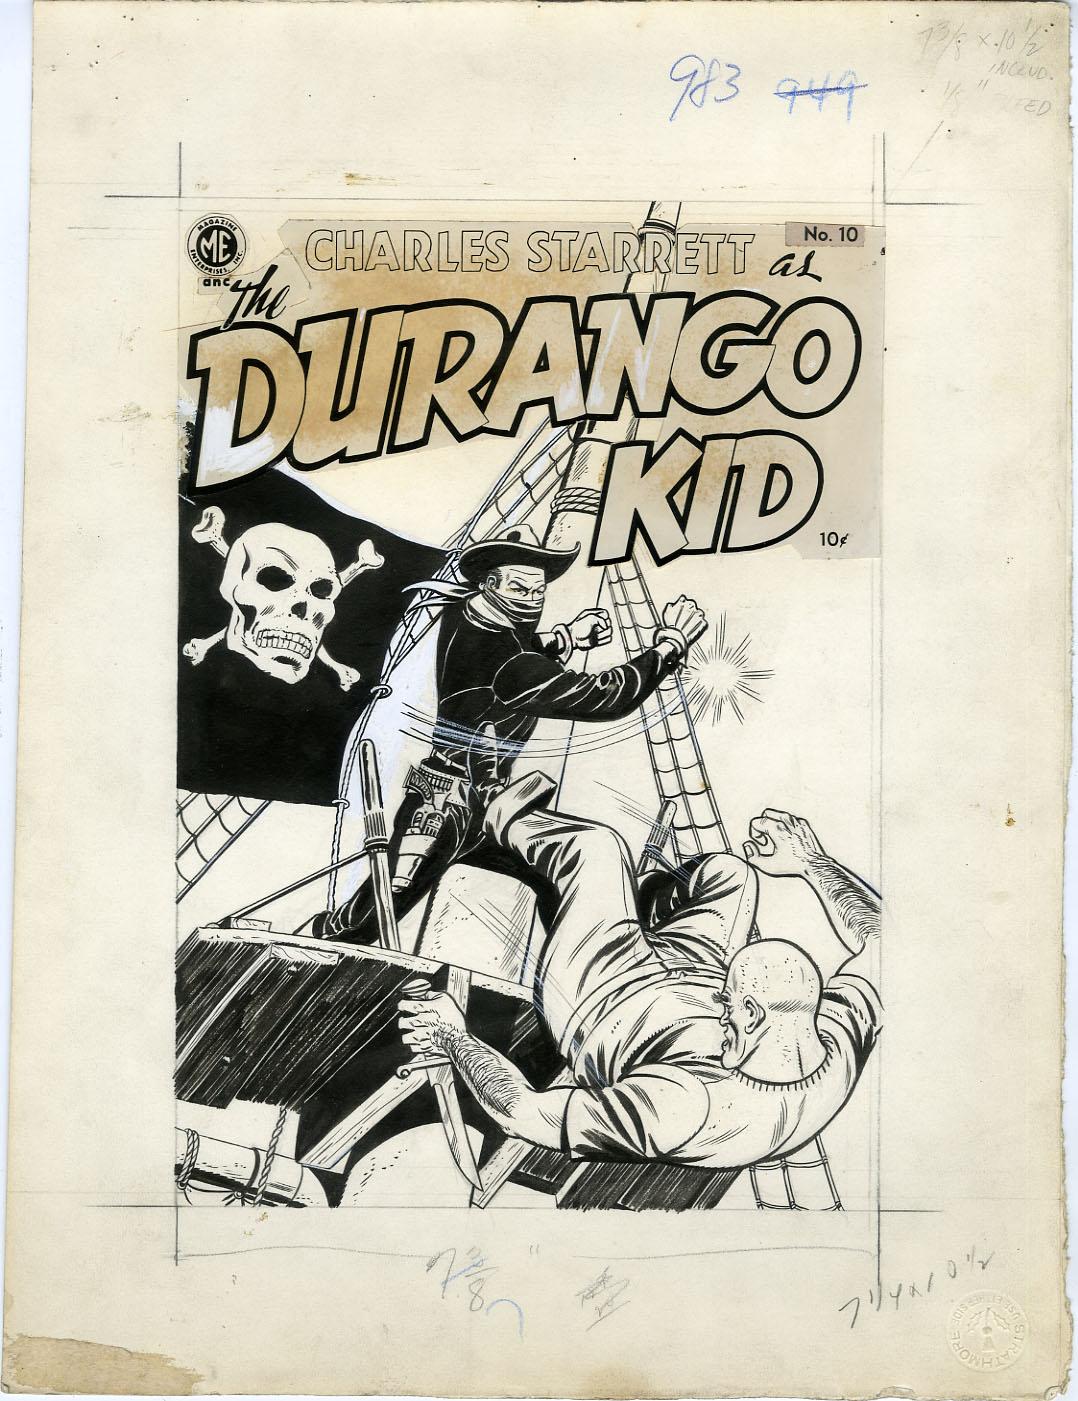 JOE CERTA (attributed) - DURANGO KID #10 COVER ORIGINAL ART